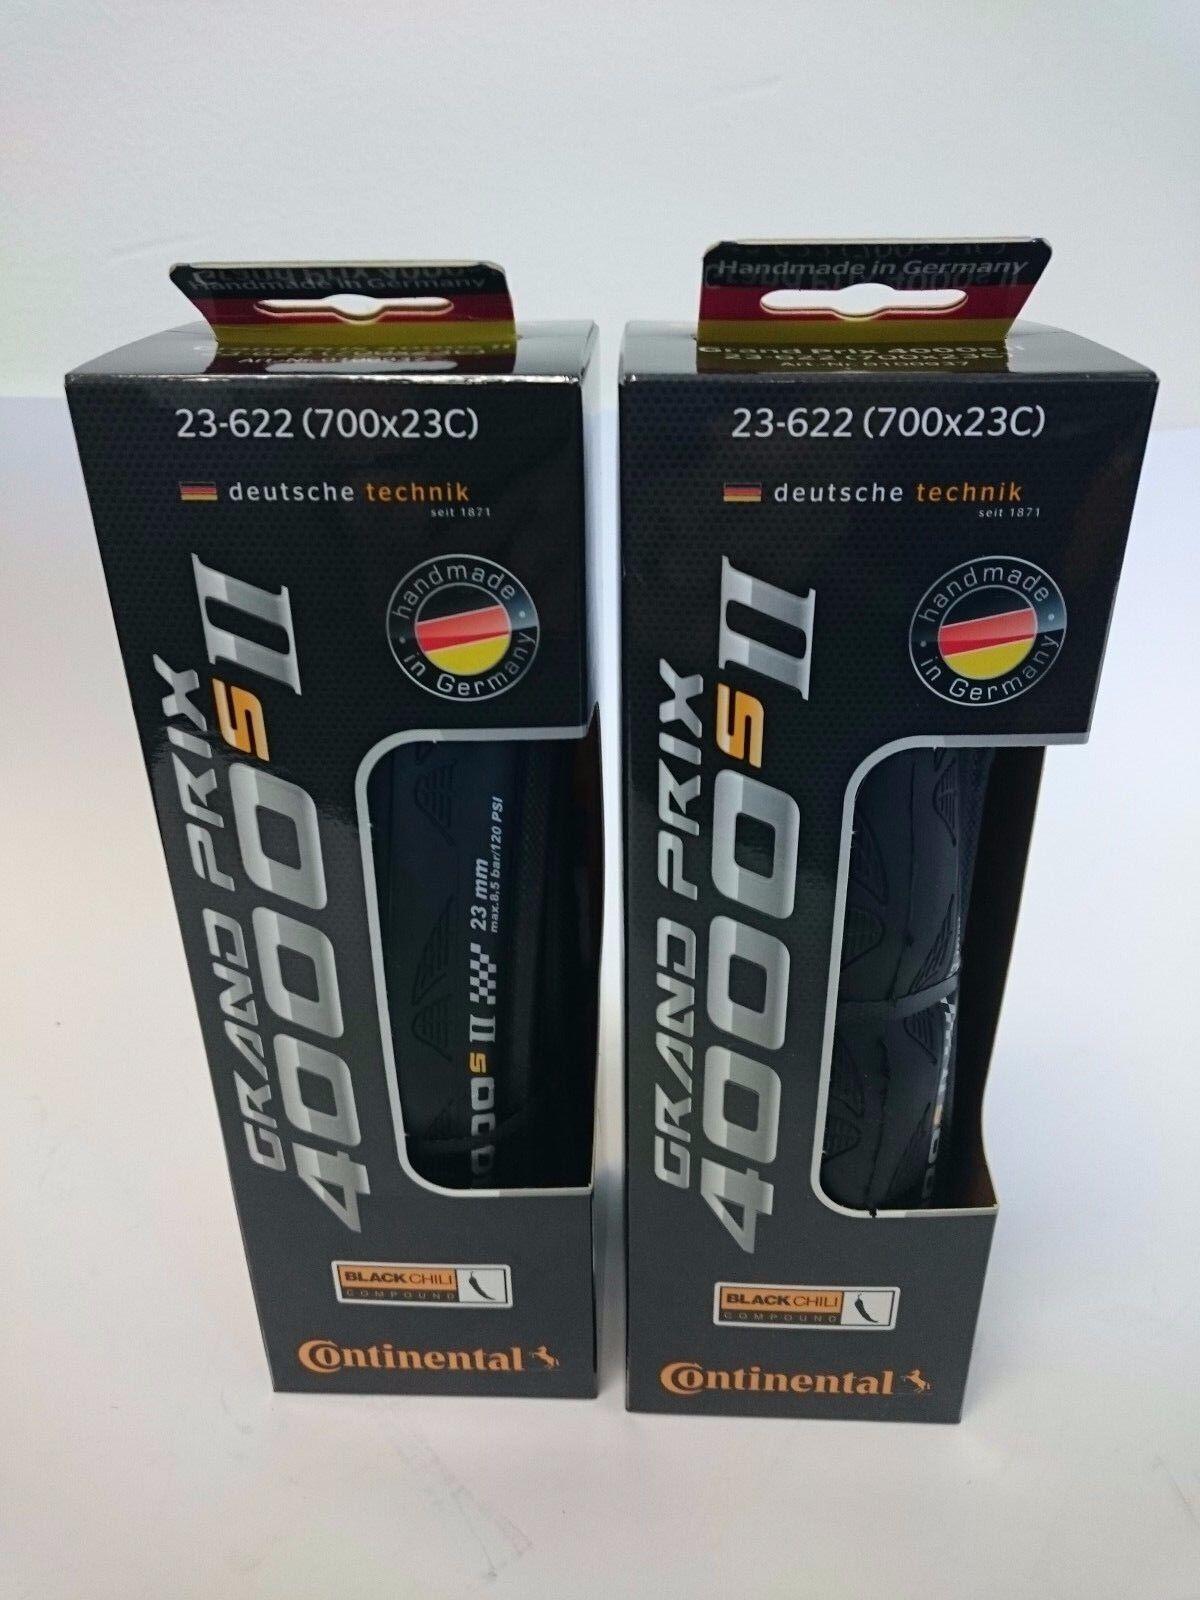 2 Pack - Continental Grand Prix 4000 SII 700 23c 25c 28c Roa